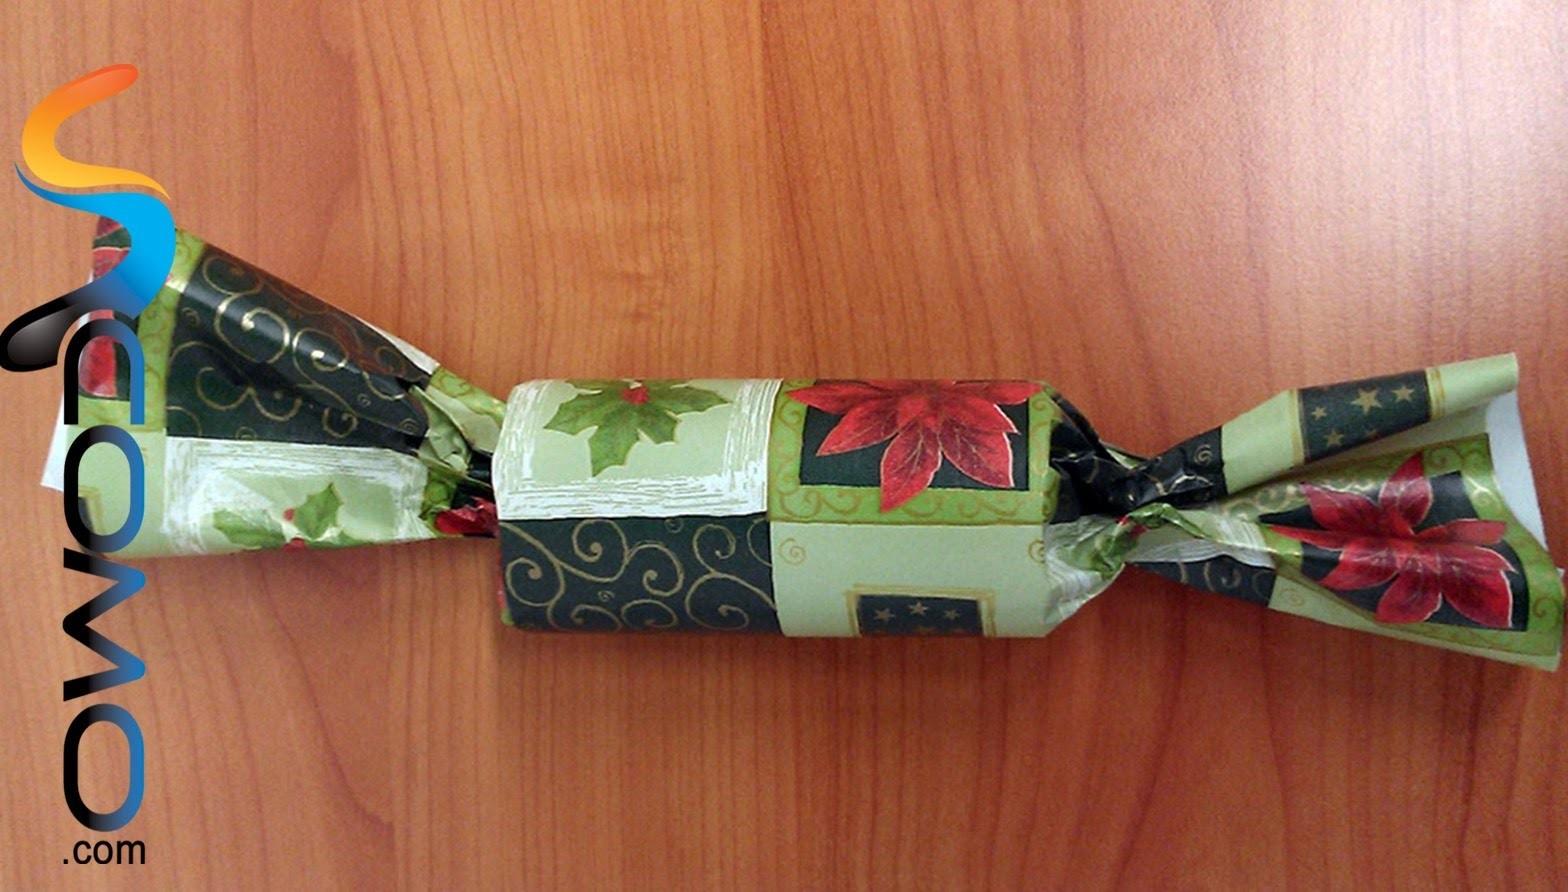 Hacer un Christmas Cracker en casa